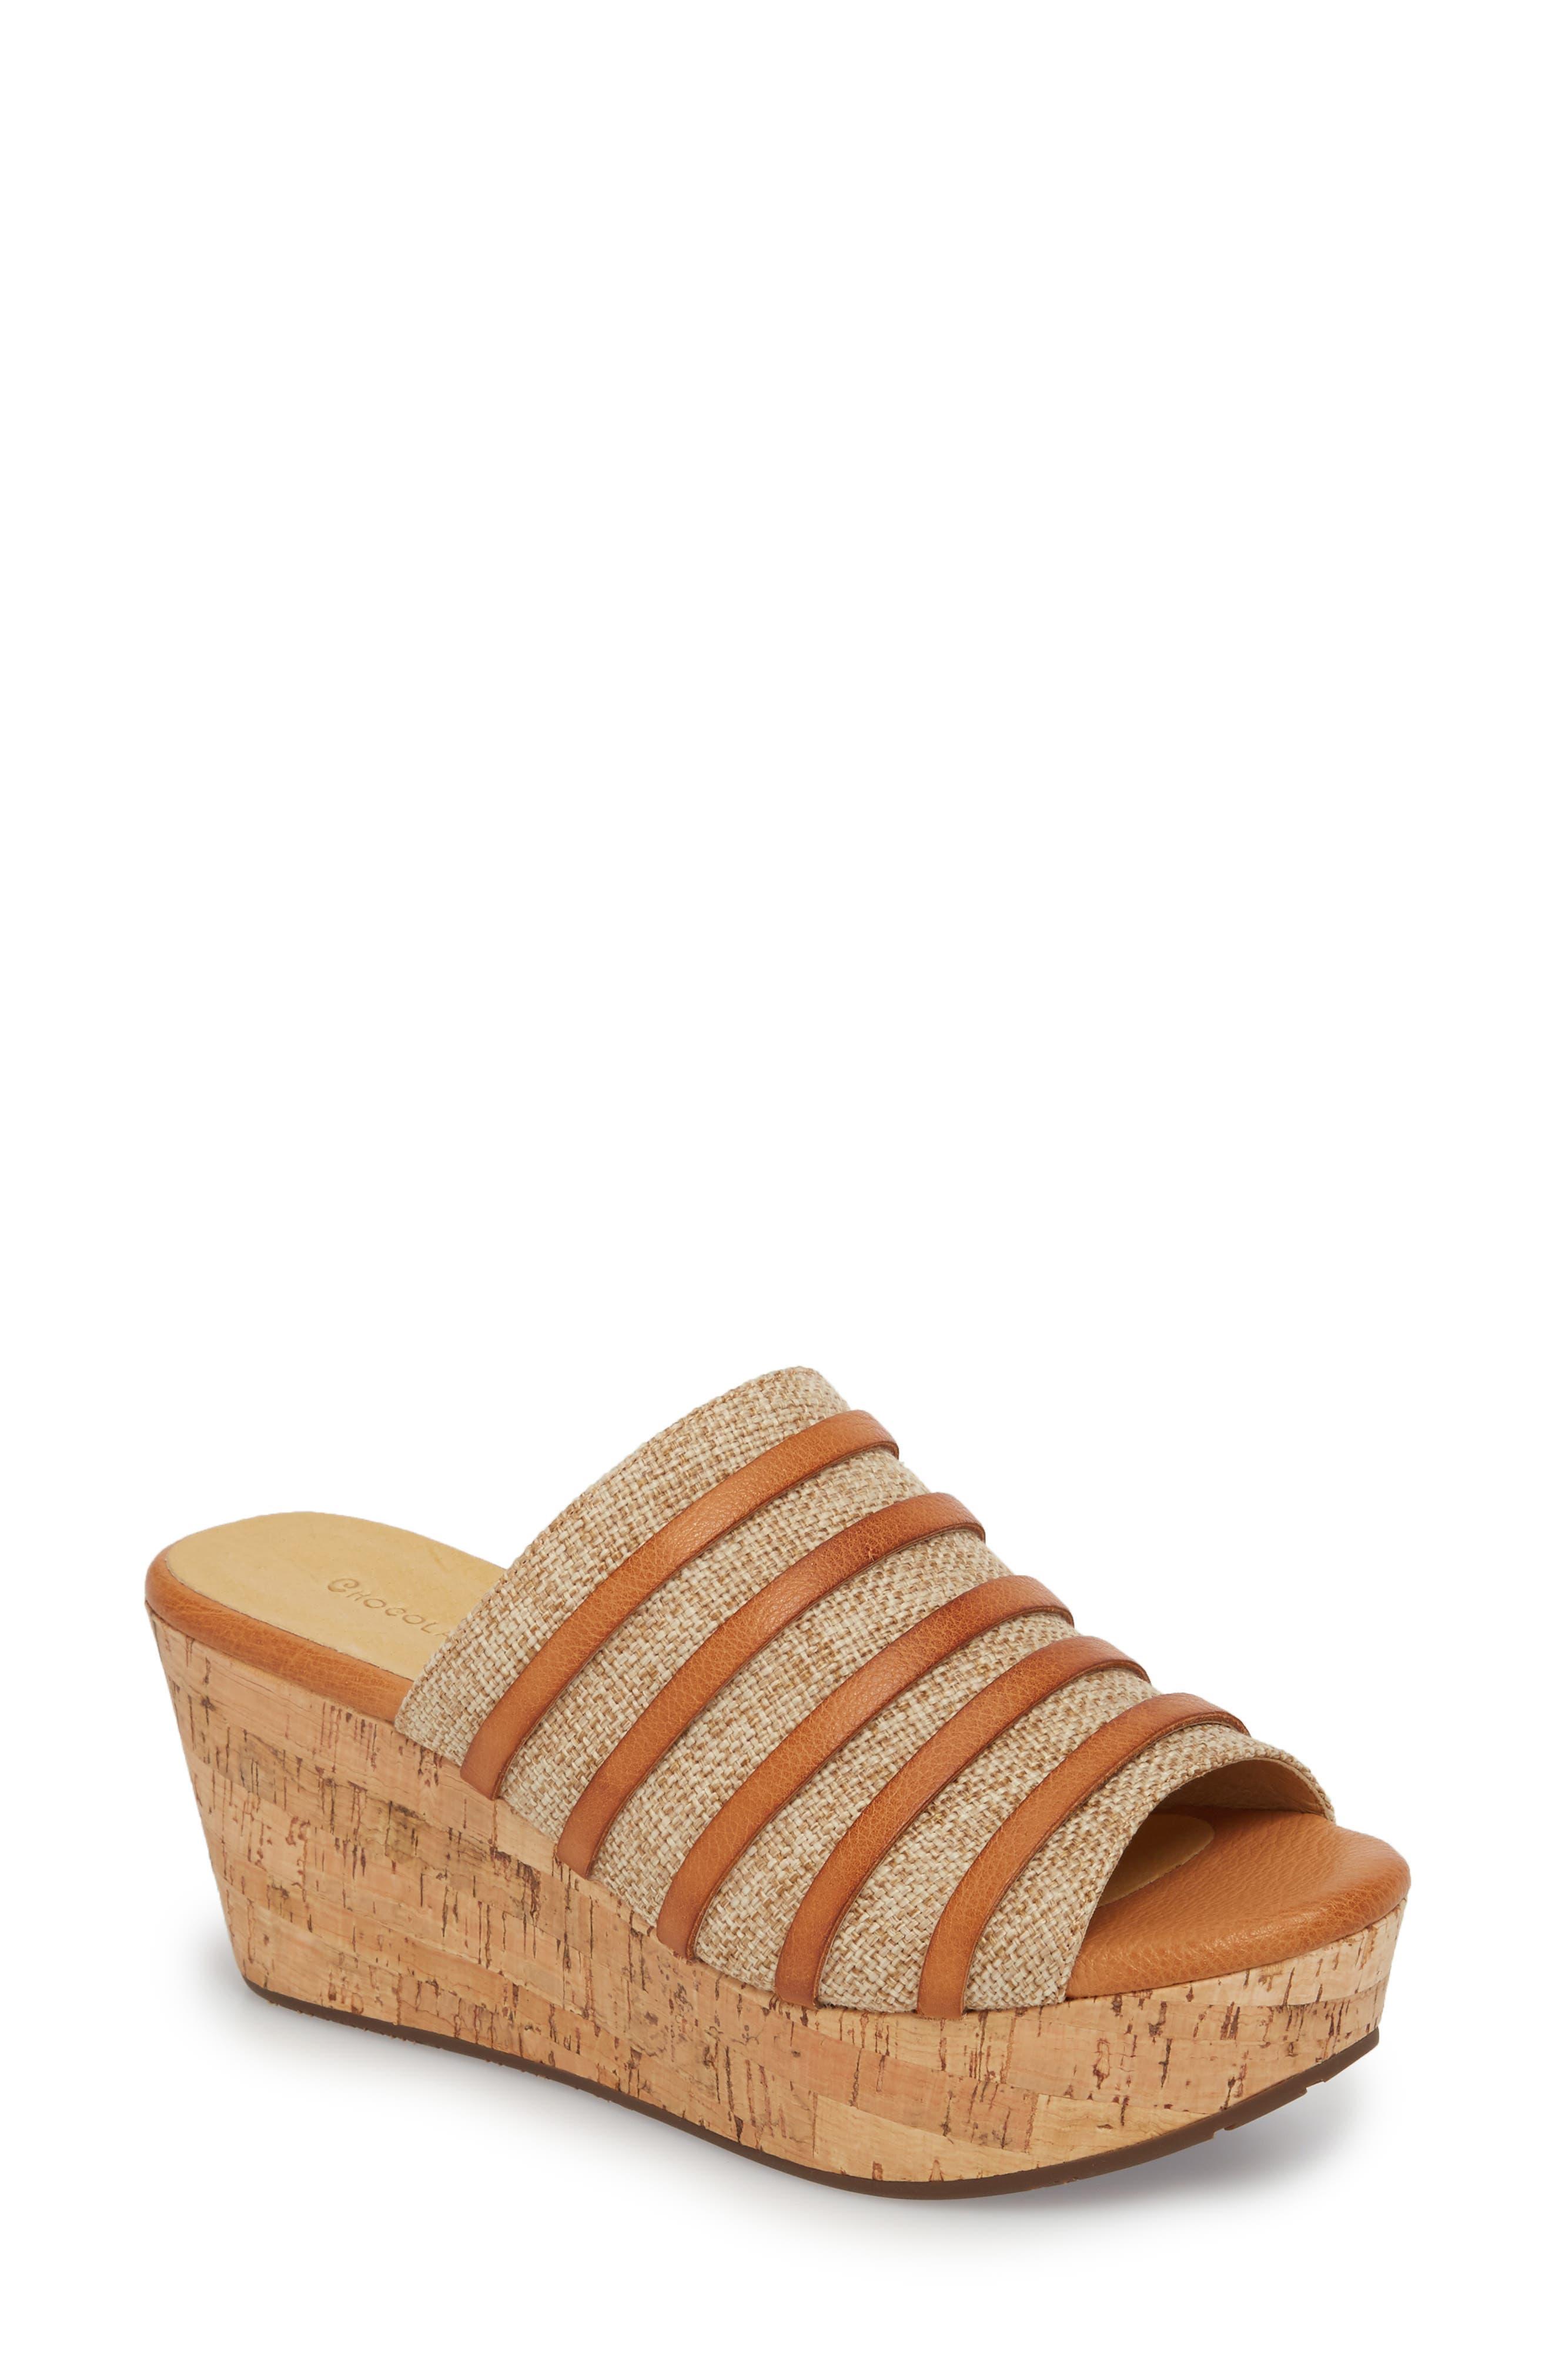 Wapi Wedge Sandal,                             Main thumbnail 1, color,                             Camel Leather